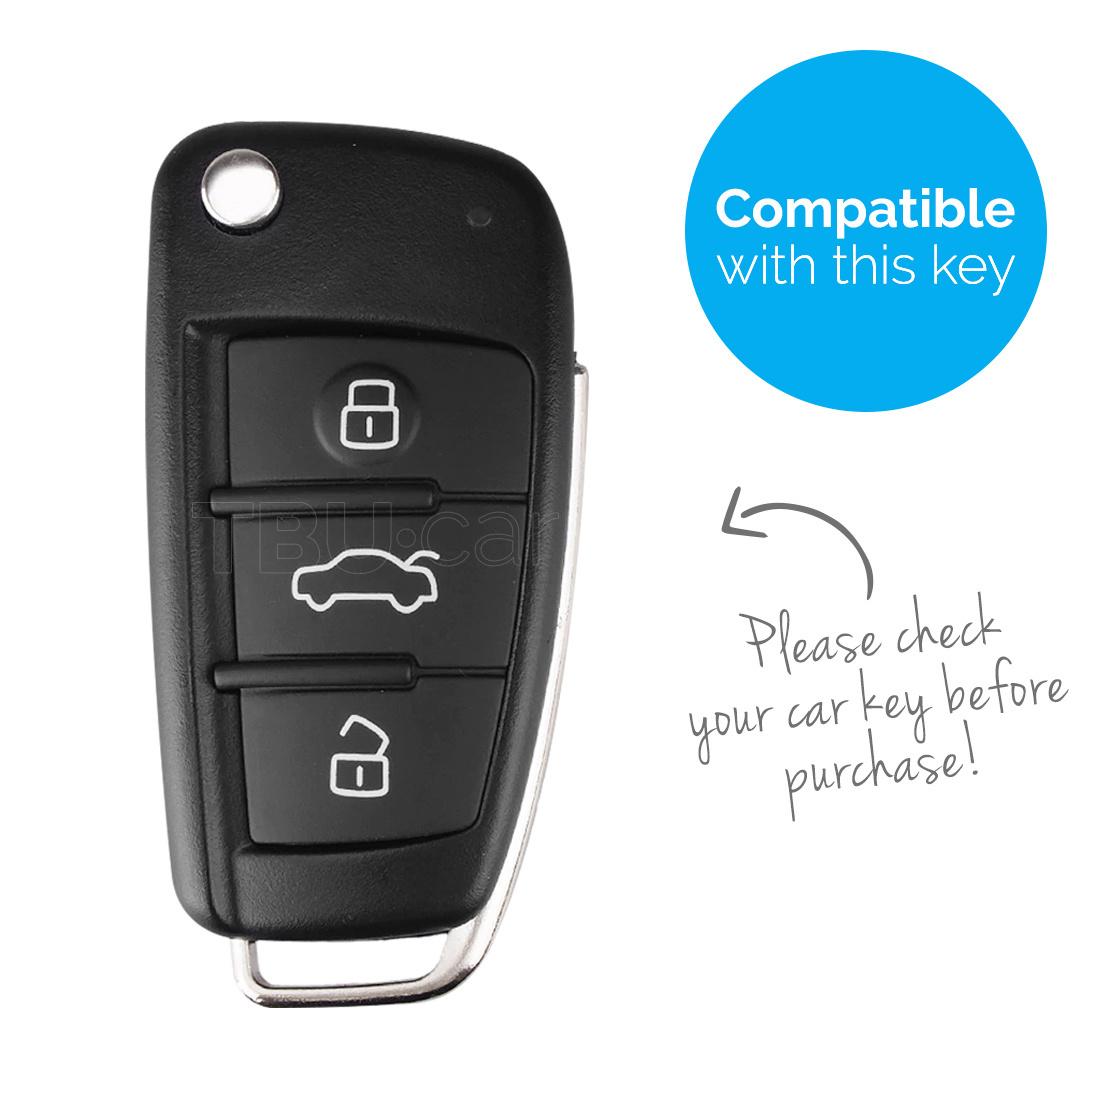 TBU car TBU car Car key cover compatible with Audi - Silicone Protective Remote Key Shell - FOB Case Cover - Blue